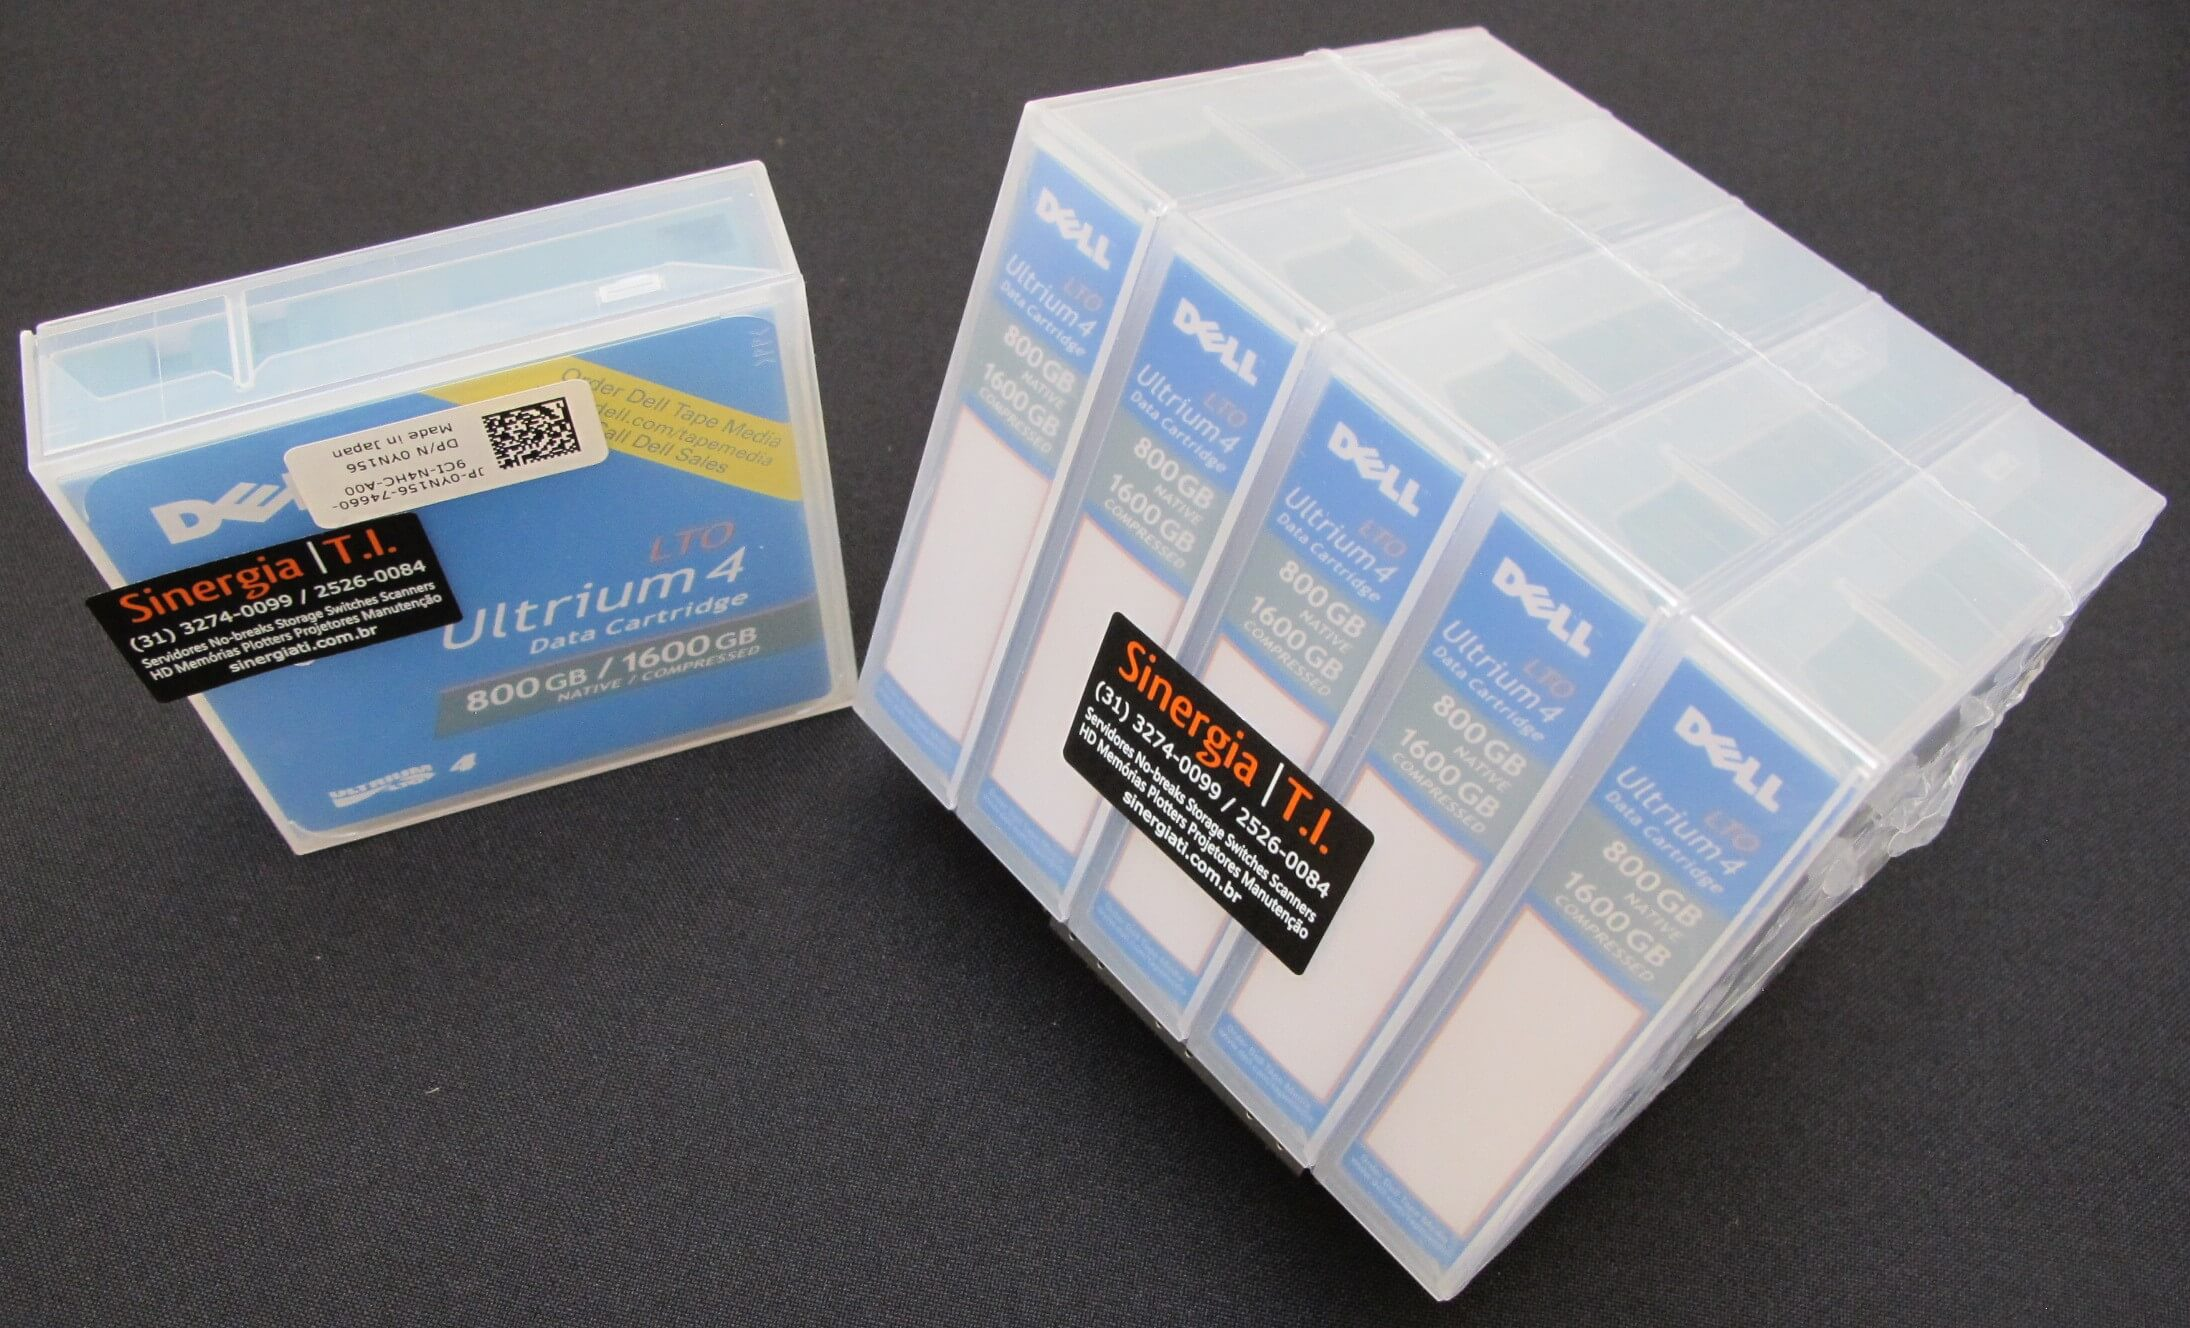 Fita de Dados LTO-4 Ultrium 4 Data Cartridge 800GB/1.6TB Dell Código do Fabricante : XW259 | Código Dell : 341-4641 foto pack 5 mídias